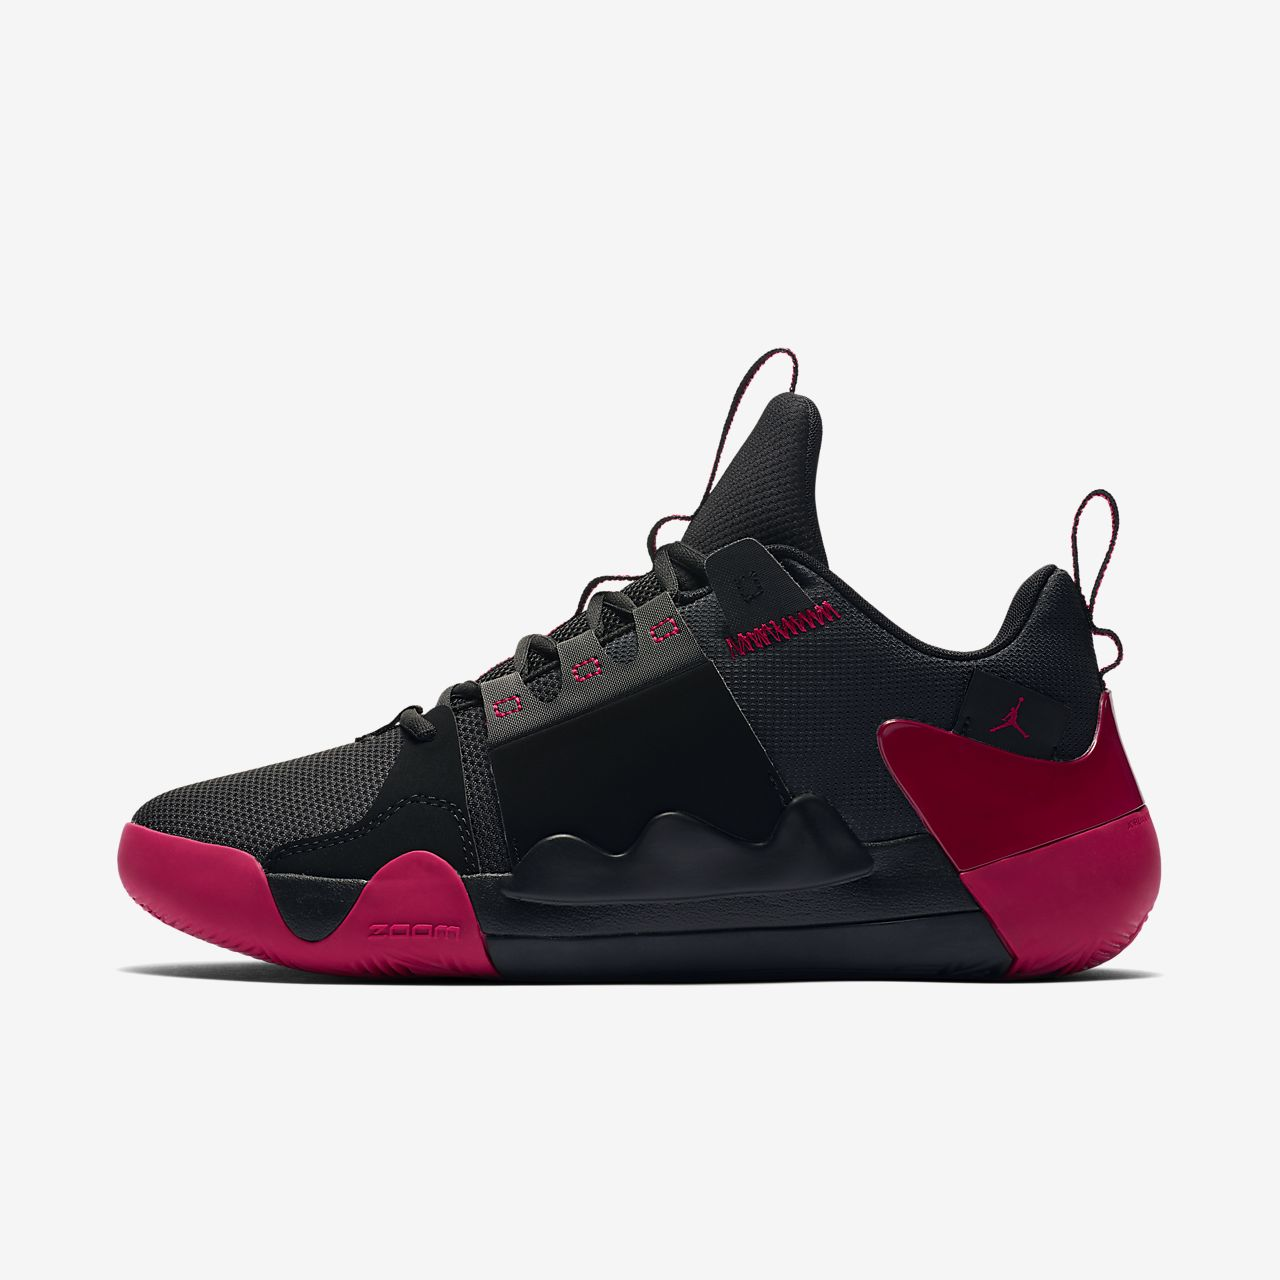 Sapatilhas de basquetebol Jordan Zoom Zero Gravity